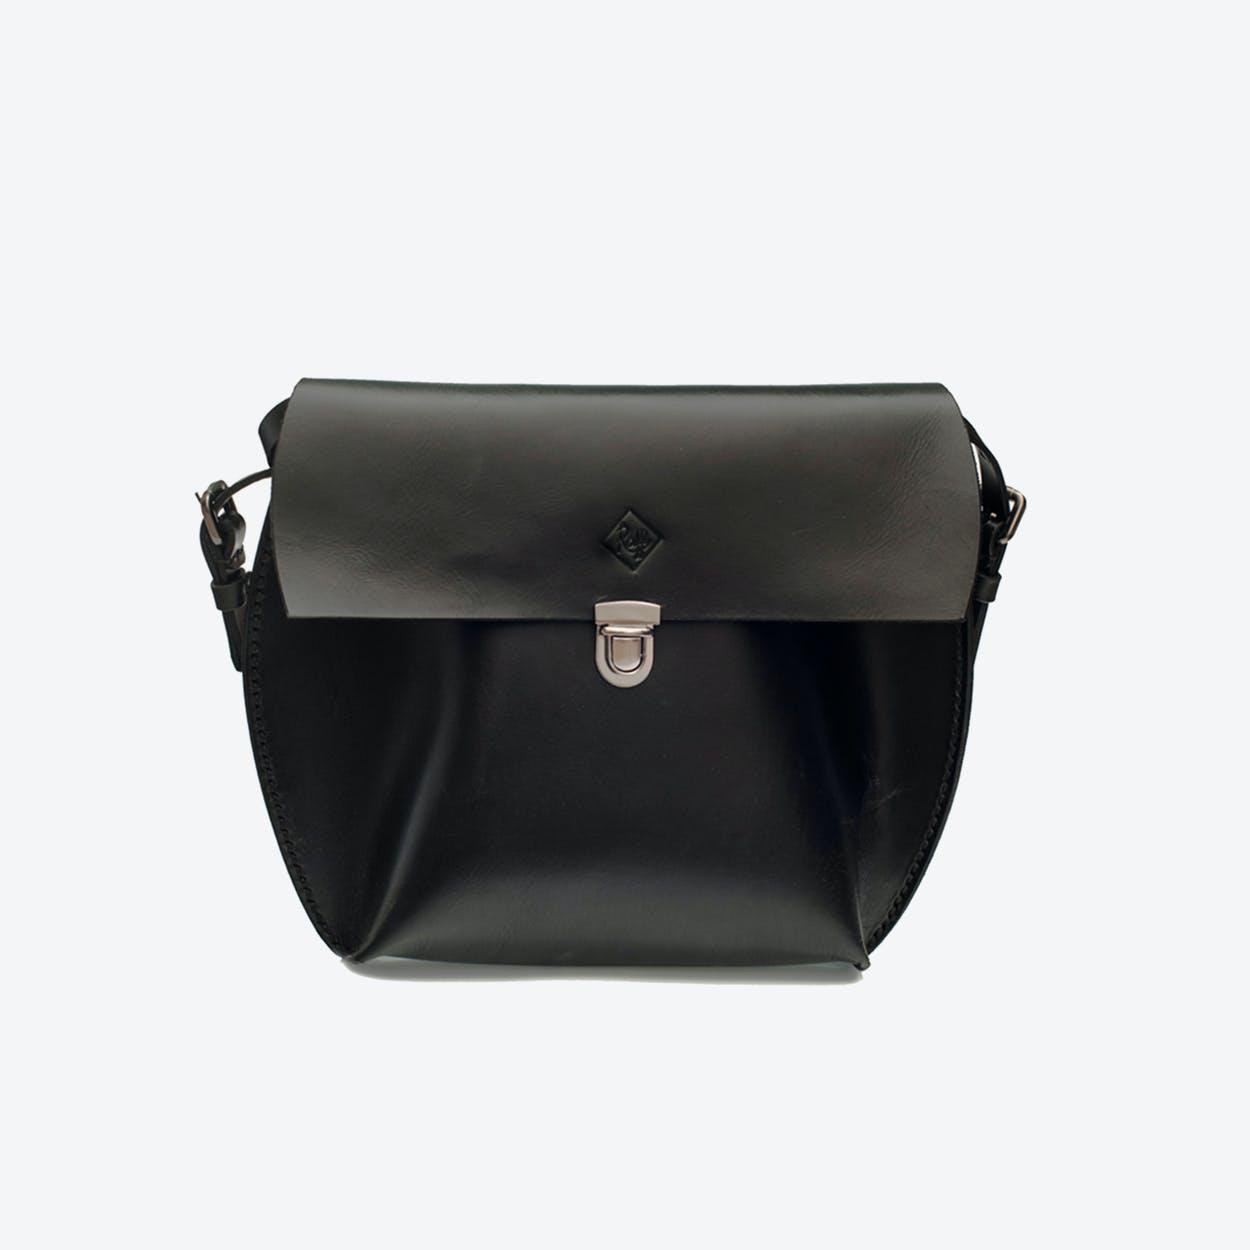 Hugo Backpack in Black